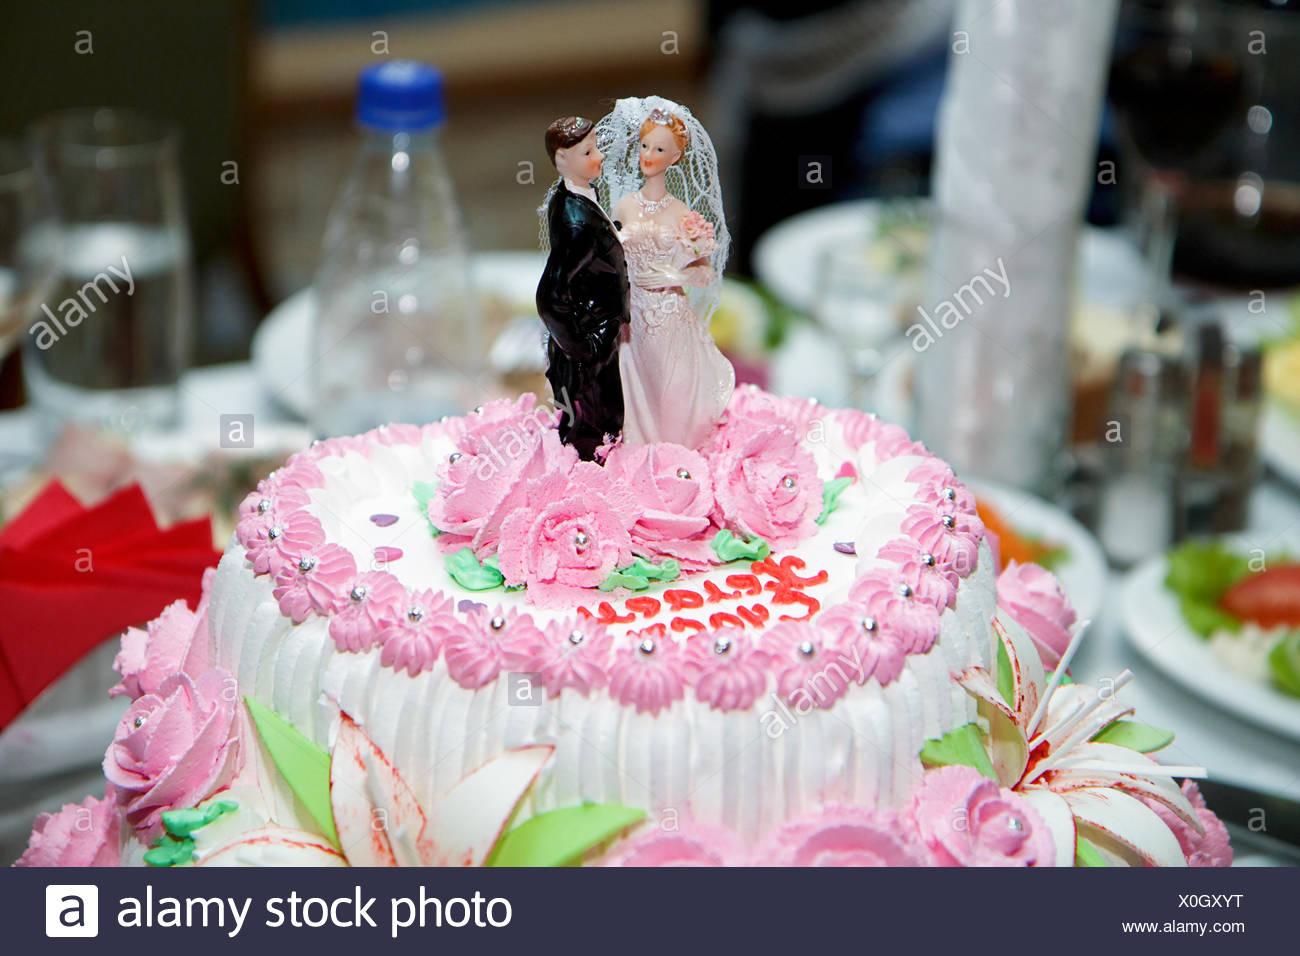 Wedding Traditional Tier White Stock Photos & Wedding Traditional ...